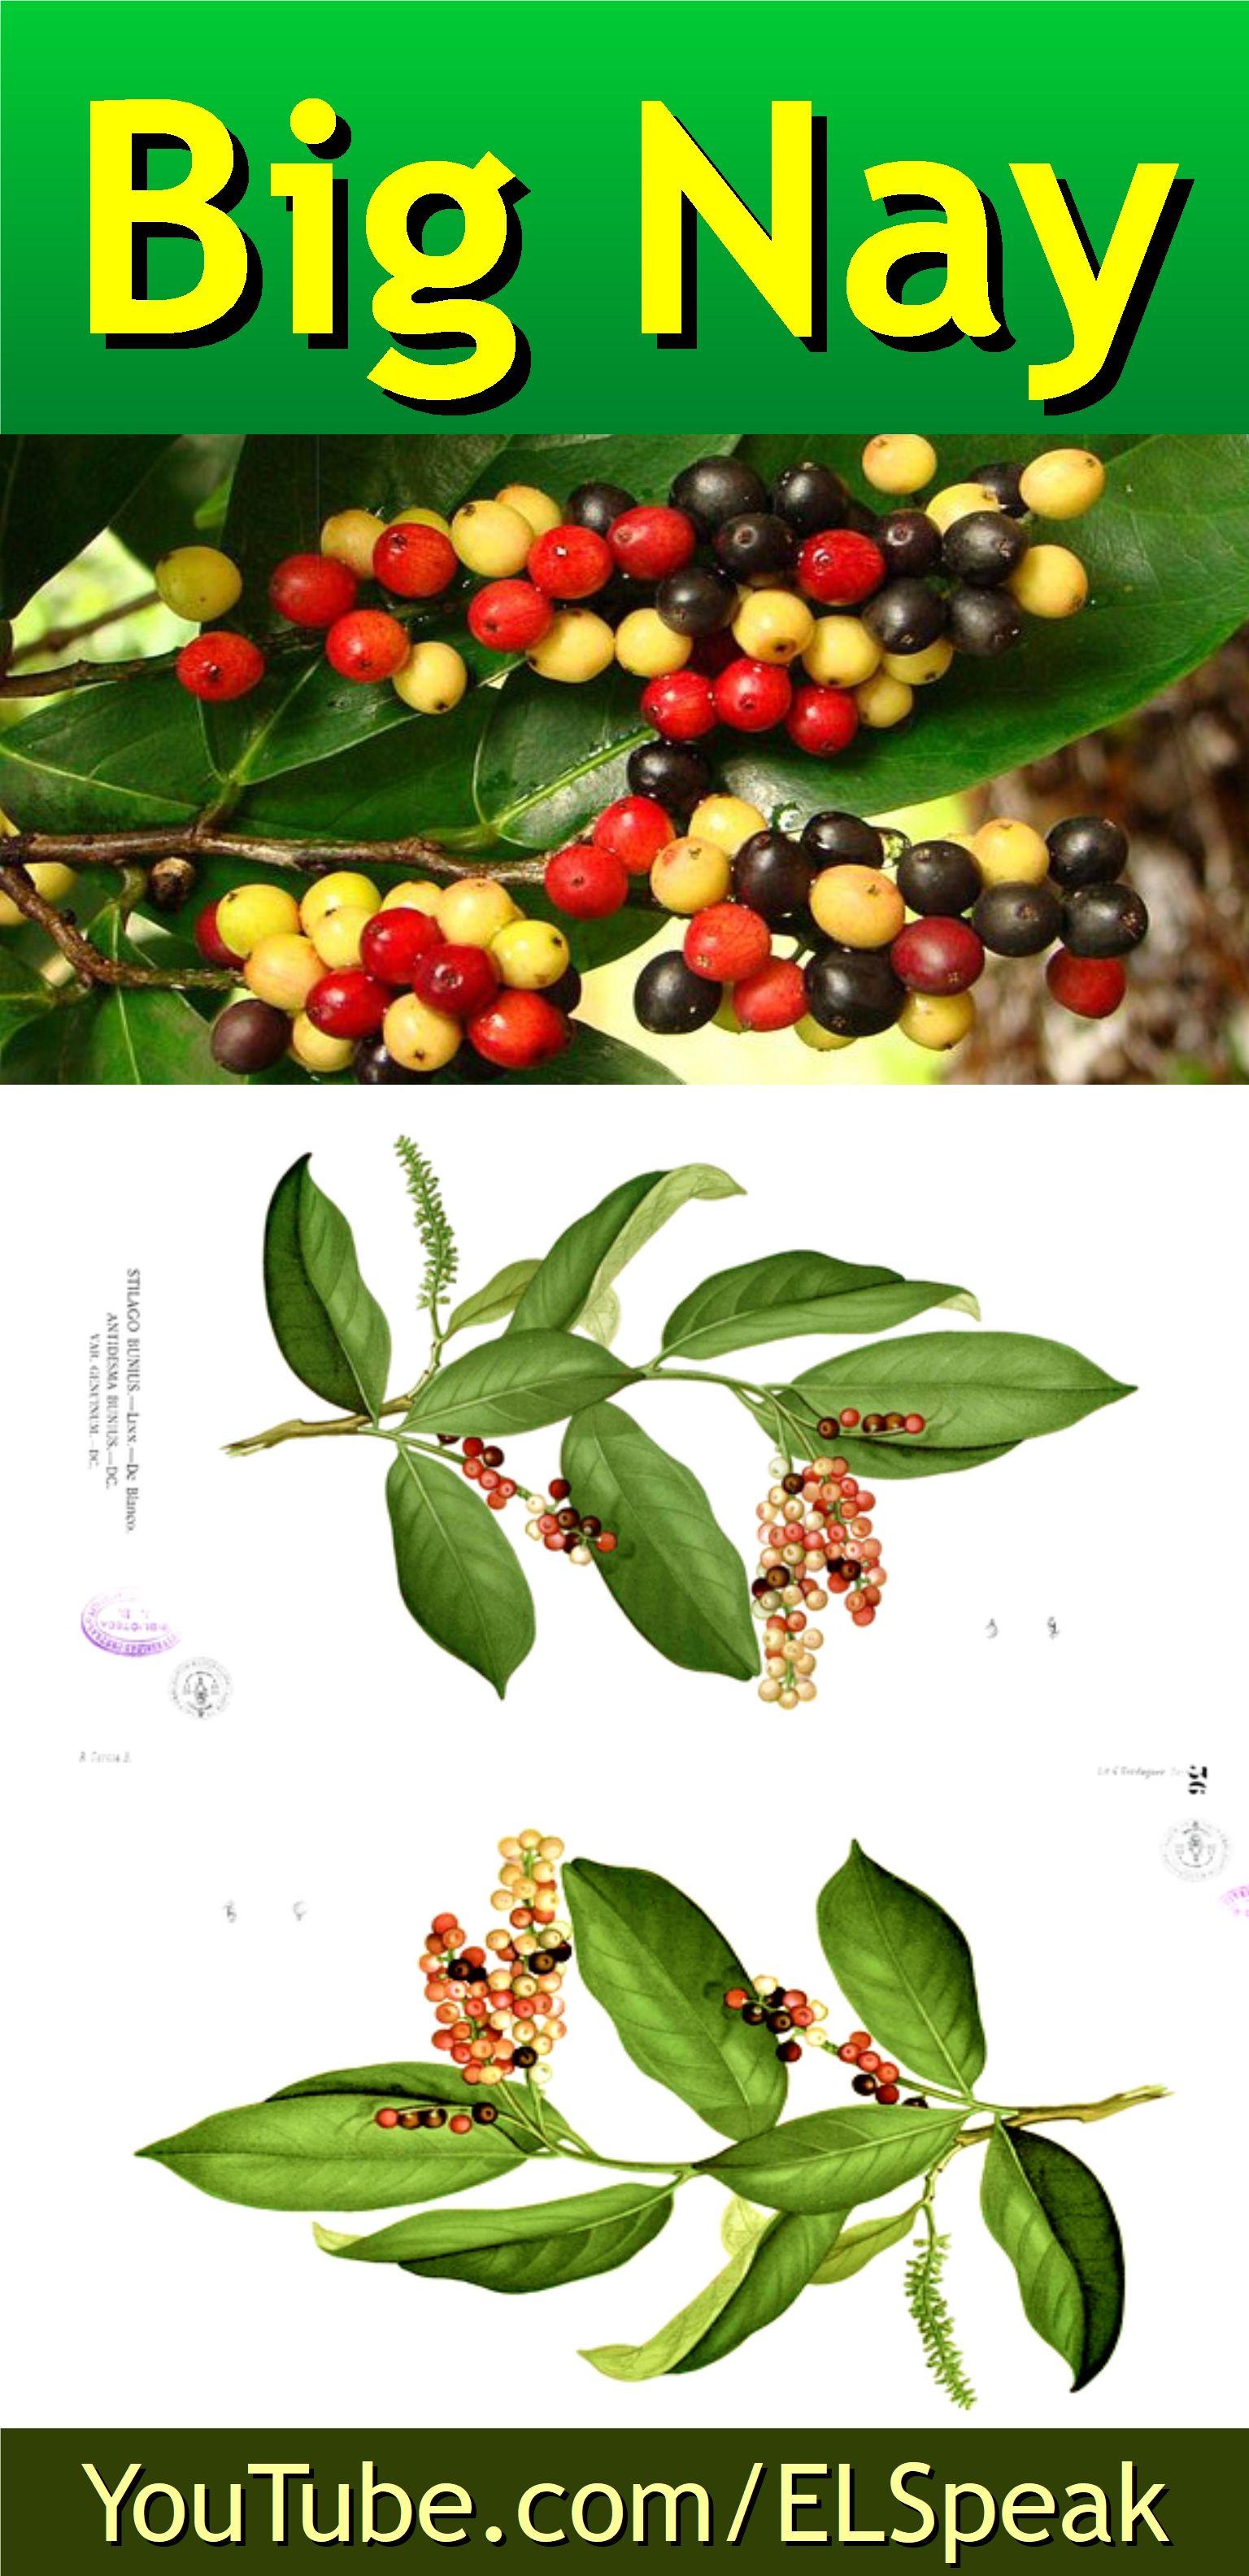 Big Nay Fruits Name In English Fruit List Fruit Names